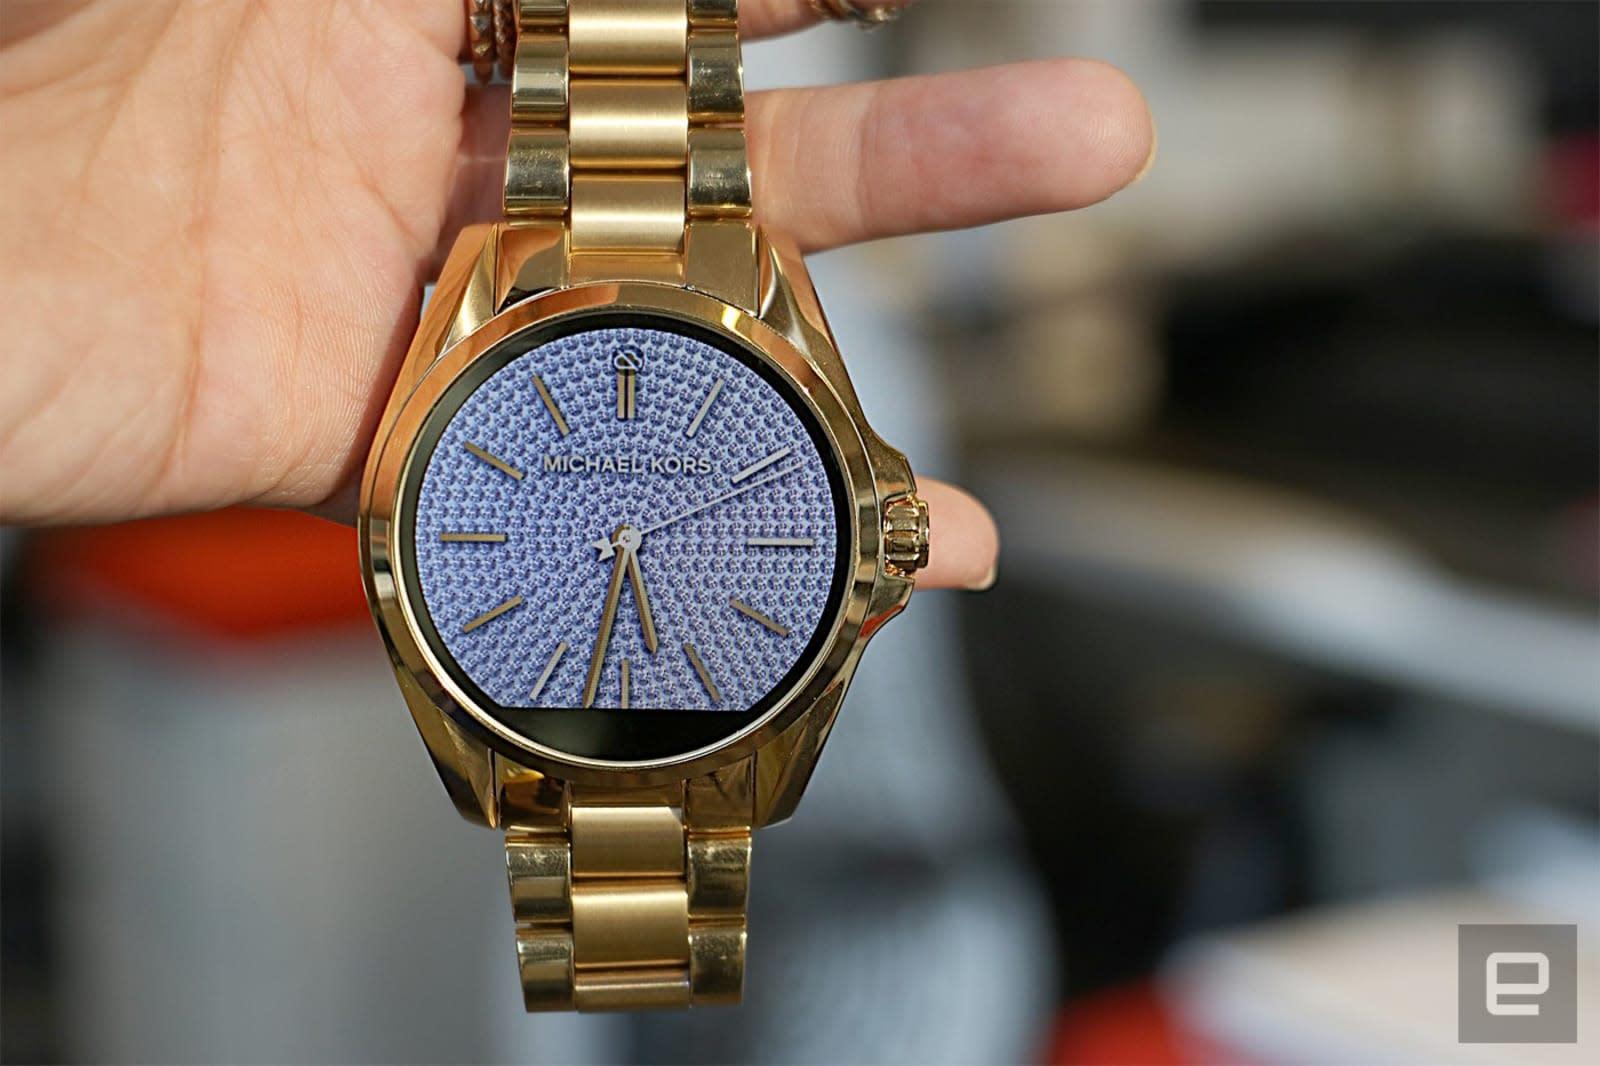 Michael Kors Access smartwatches' value is face deep